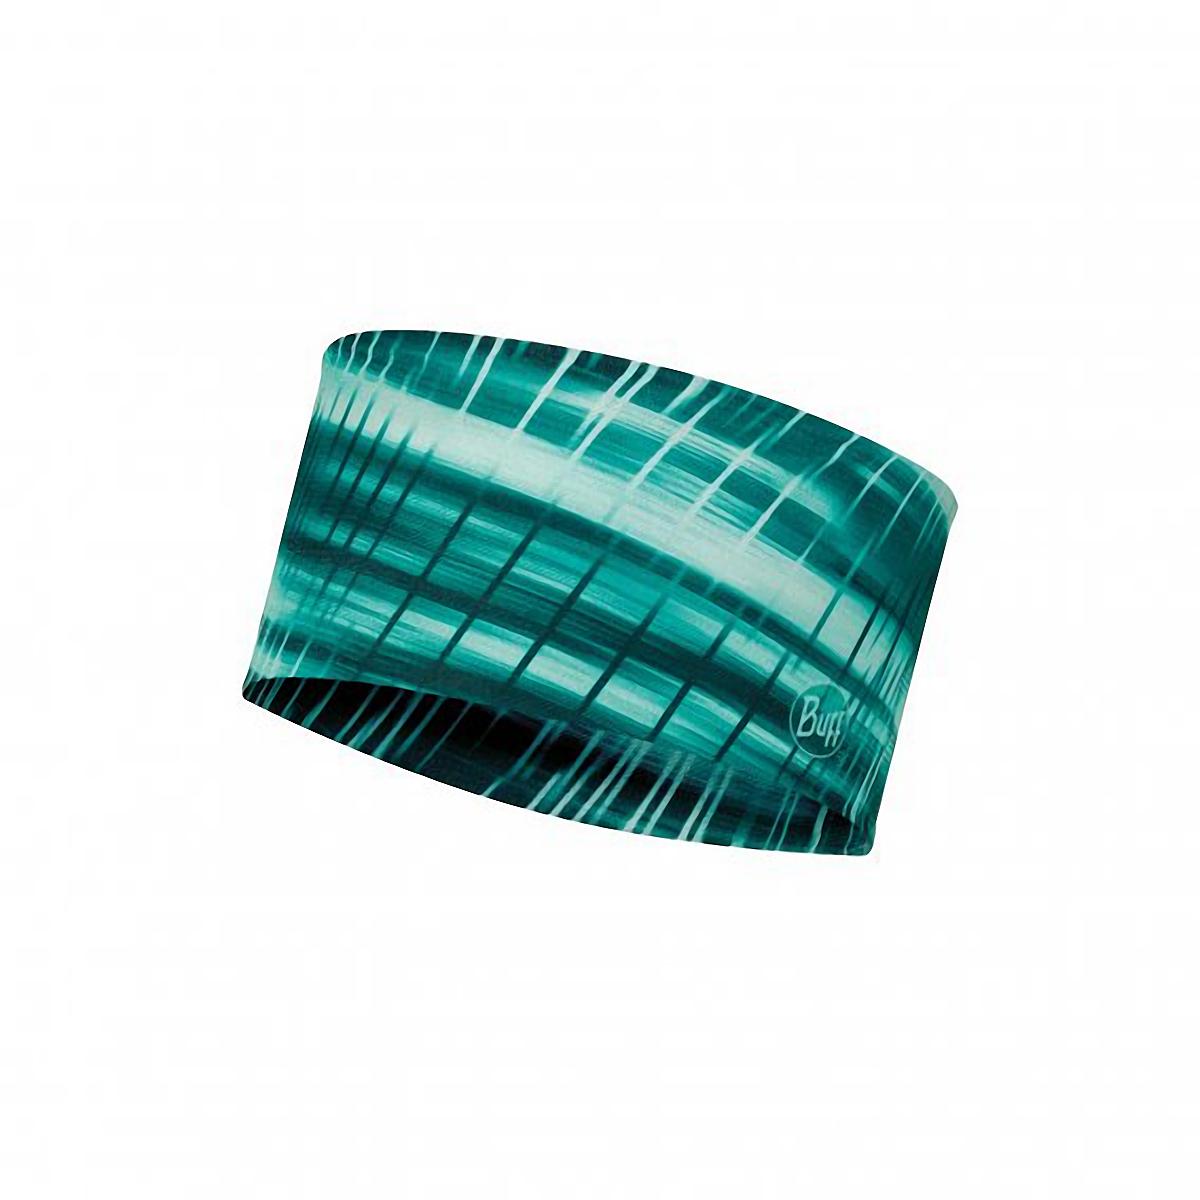 Buff Coolnet UV+ Headband - Color: Keren Turquoise, Keren Turquoise, large, image 1